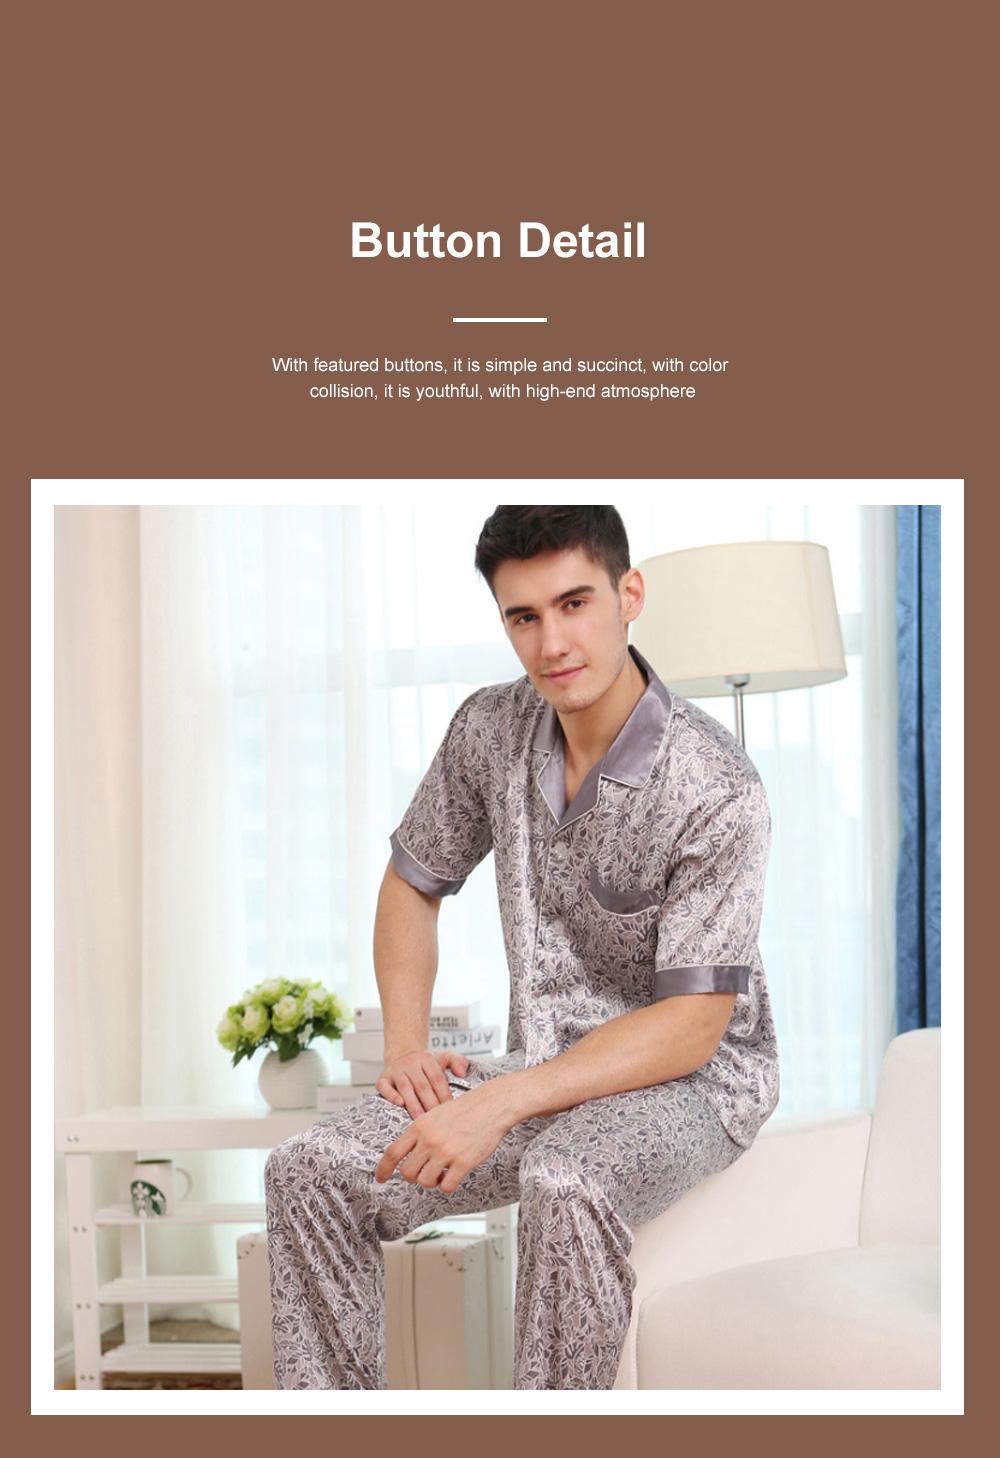 Autumn Short Sleeve Pants Ice Silk Lapel Pajamas Summer Lattice Thin Pajamas Men's Large Size Loose Home Set 4